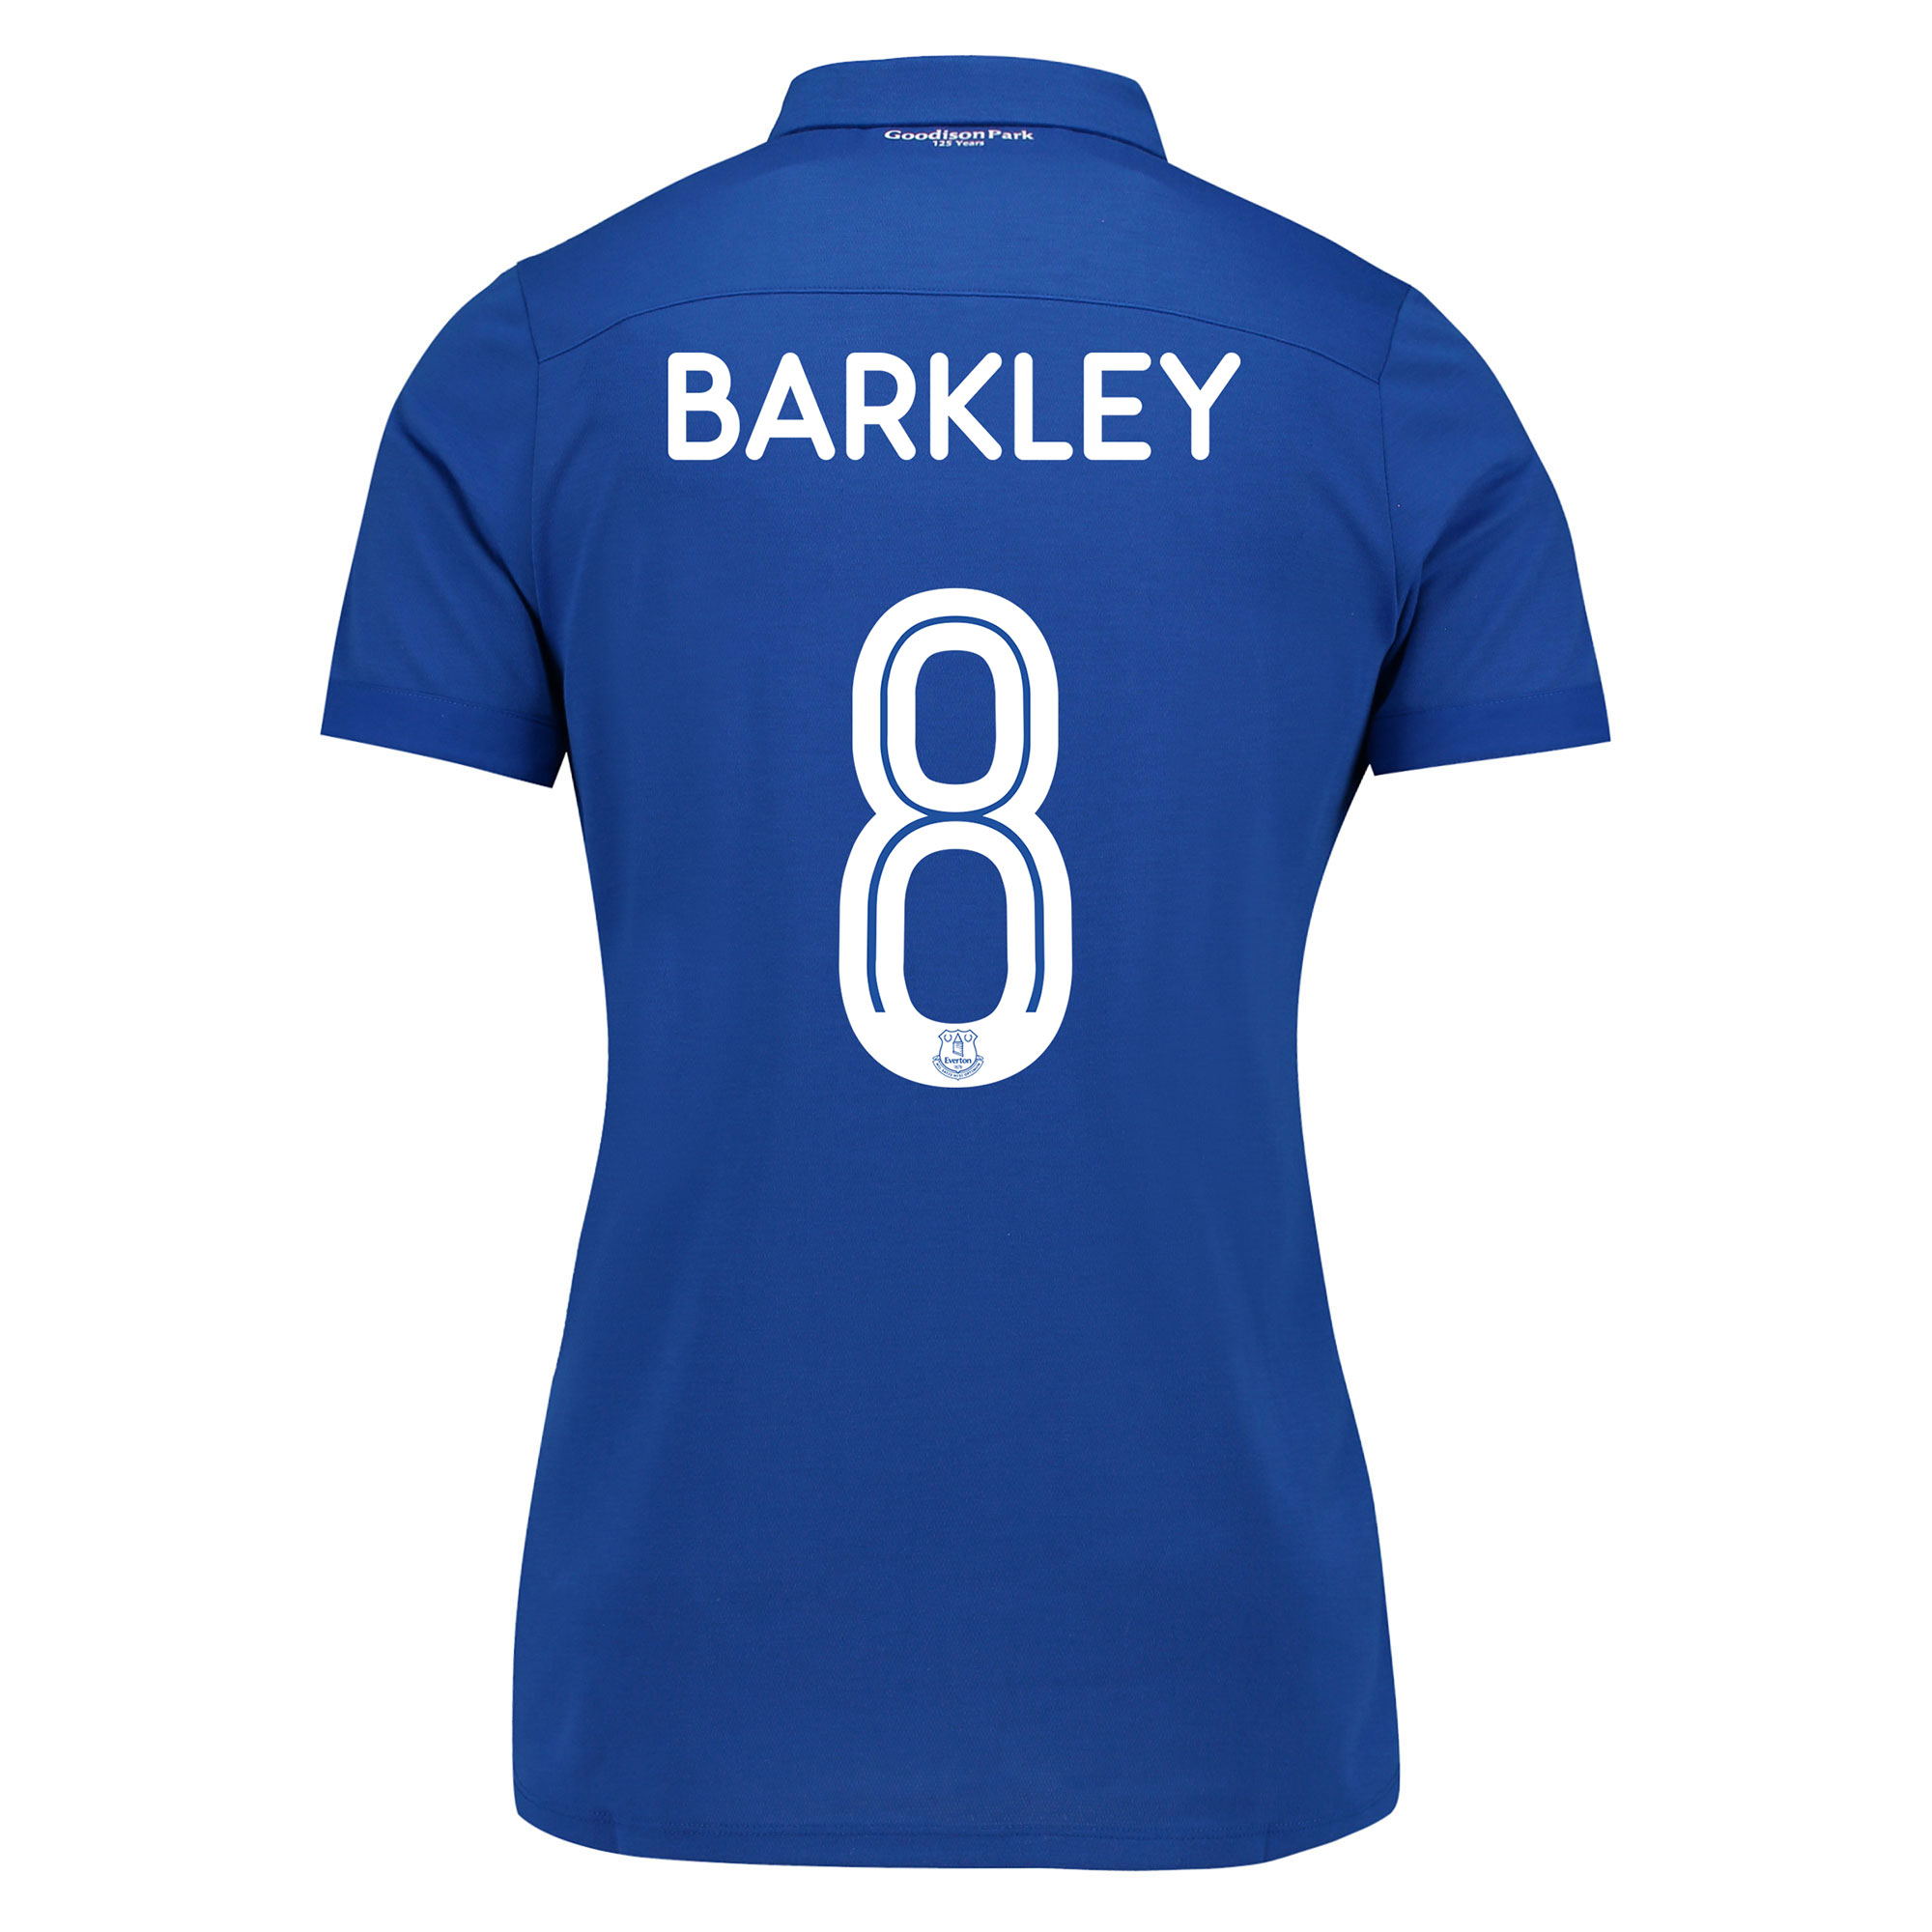 Image of Everton Commemorative Shirt - Womens with Barkley 8 printing